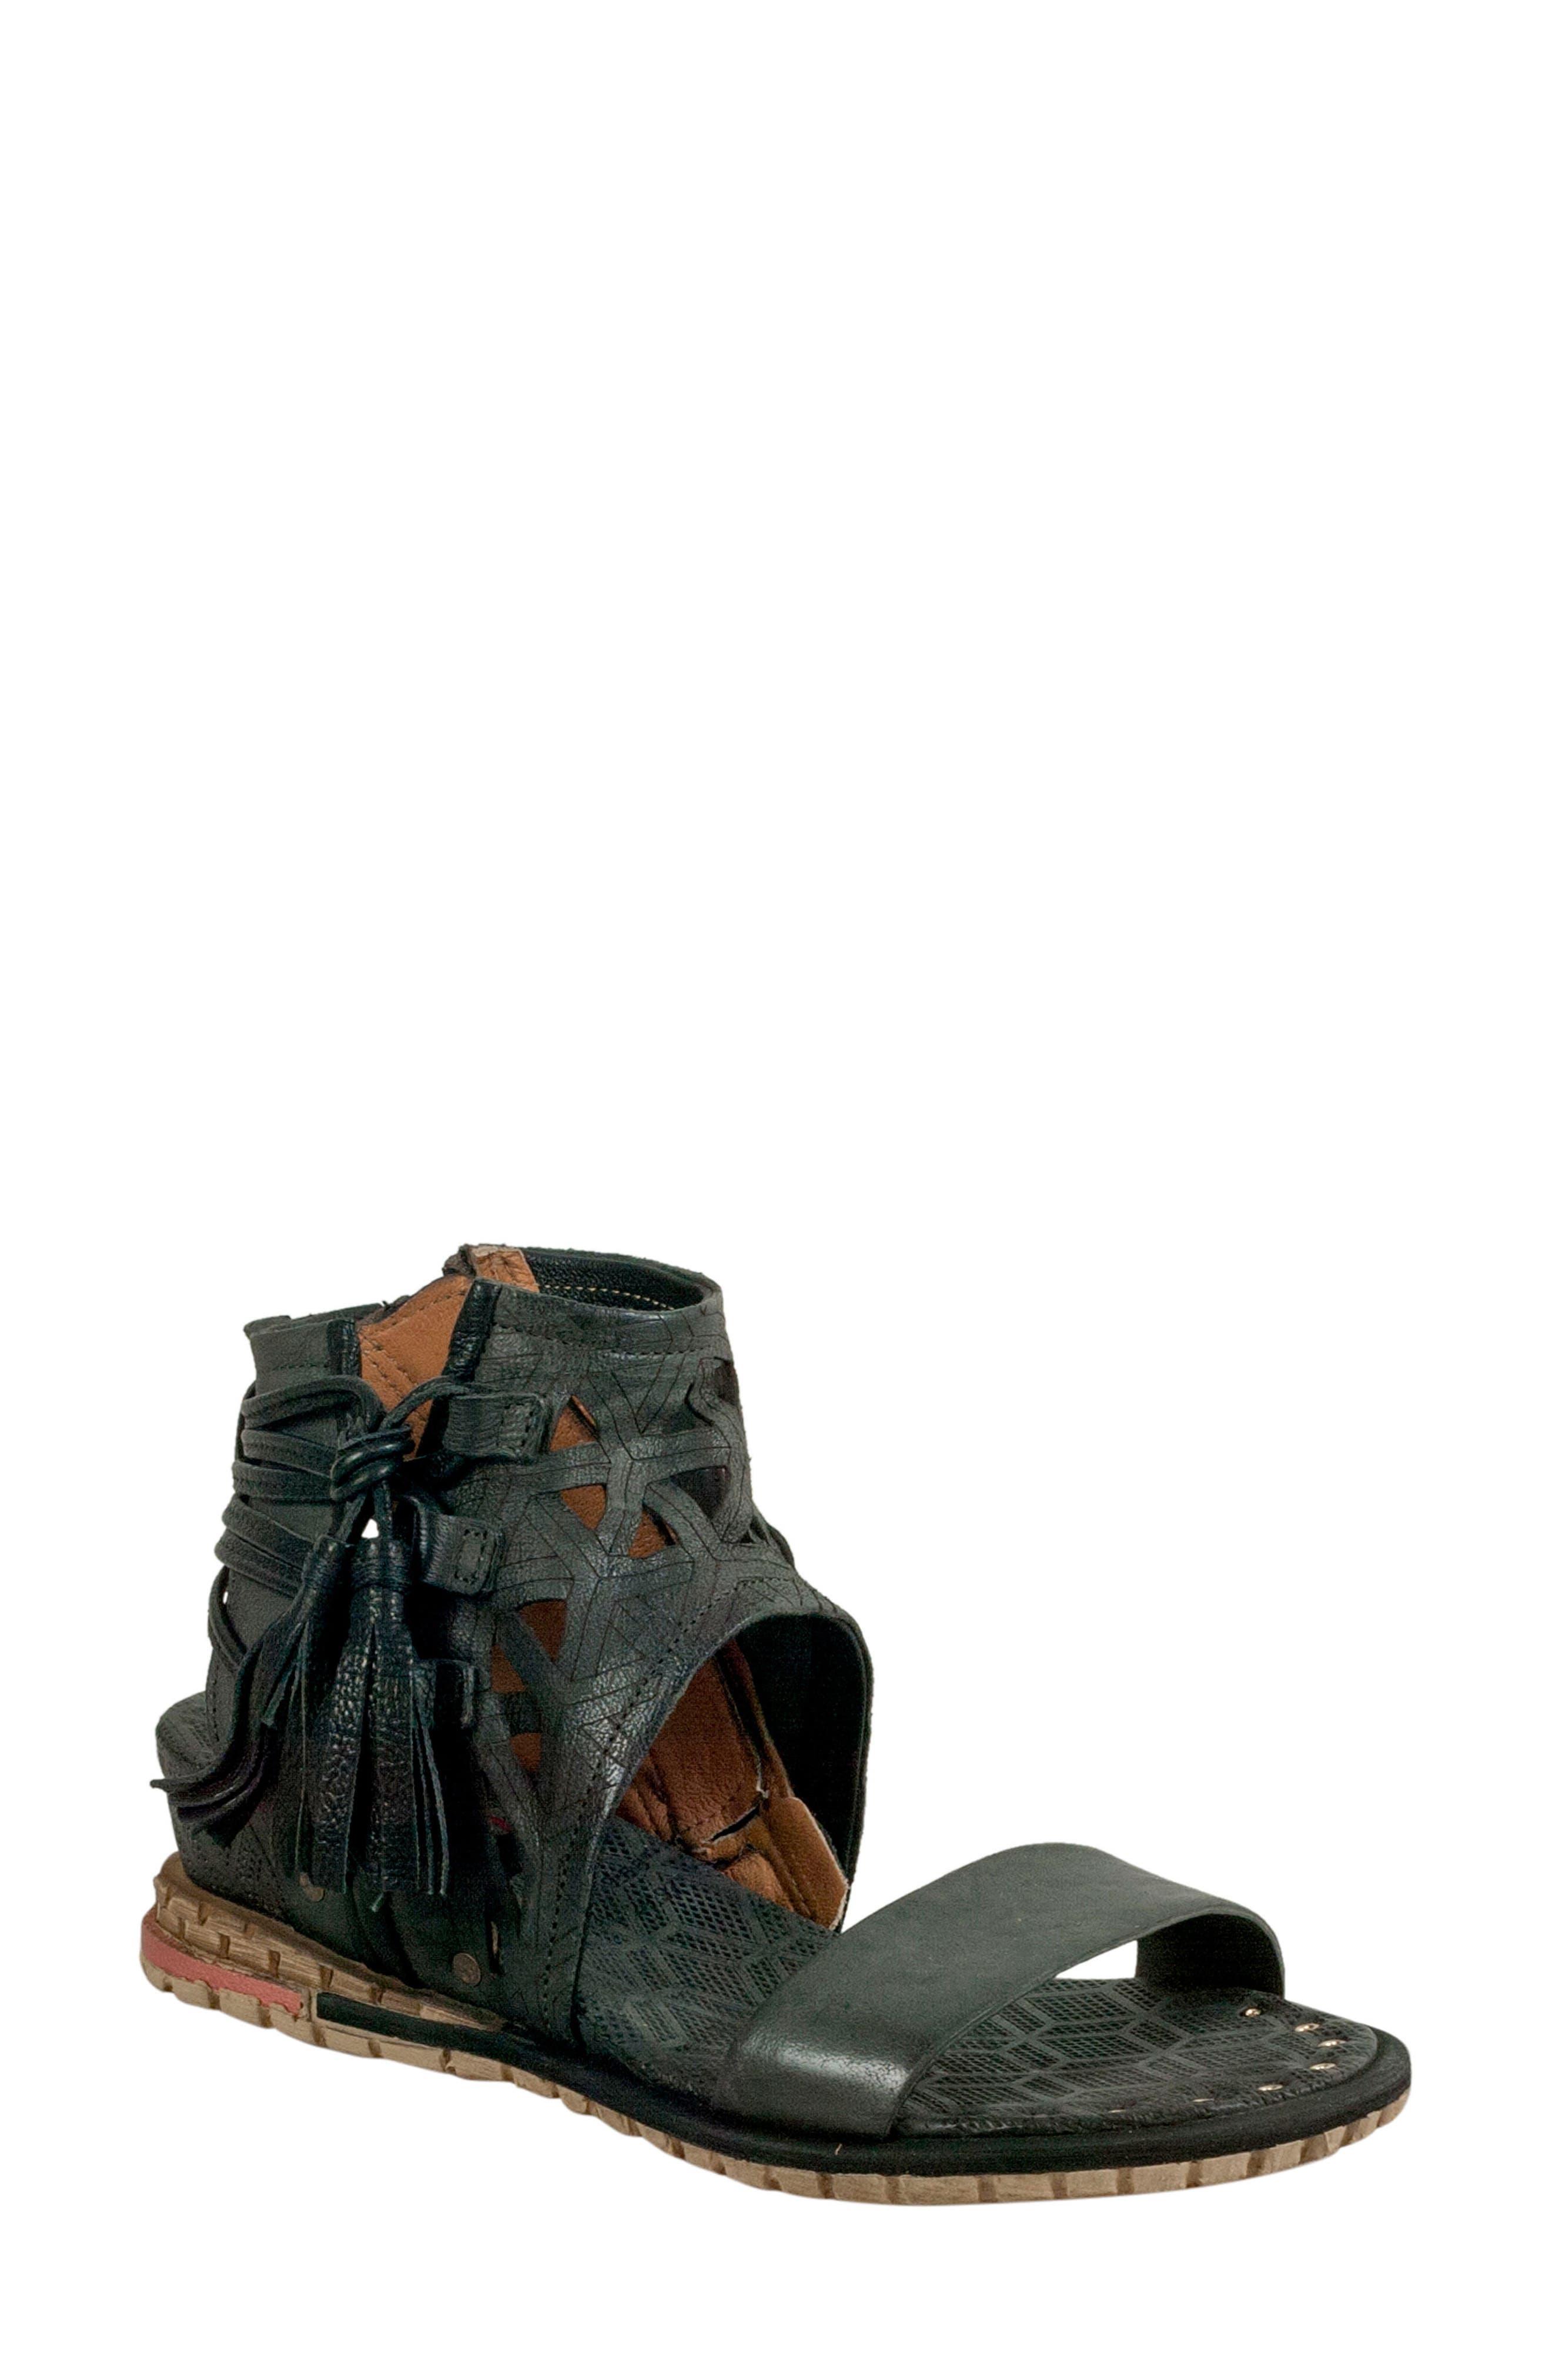 Petrona Ankle Shield Sandal,                             Main thumbnail 1, color,                             095